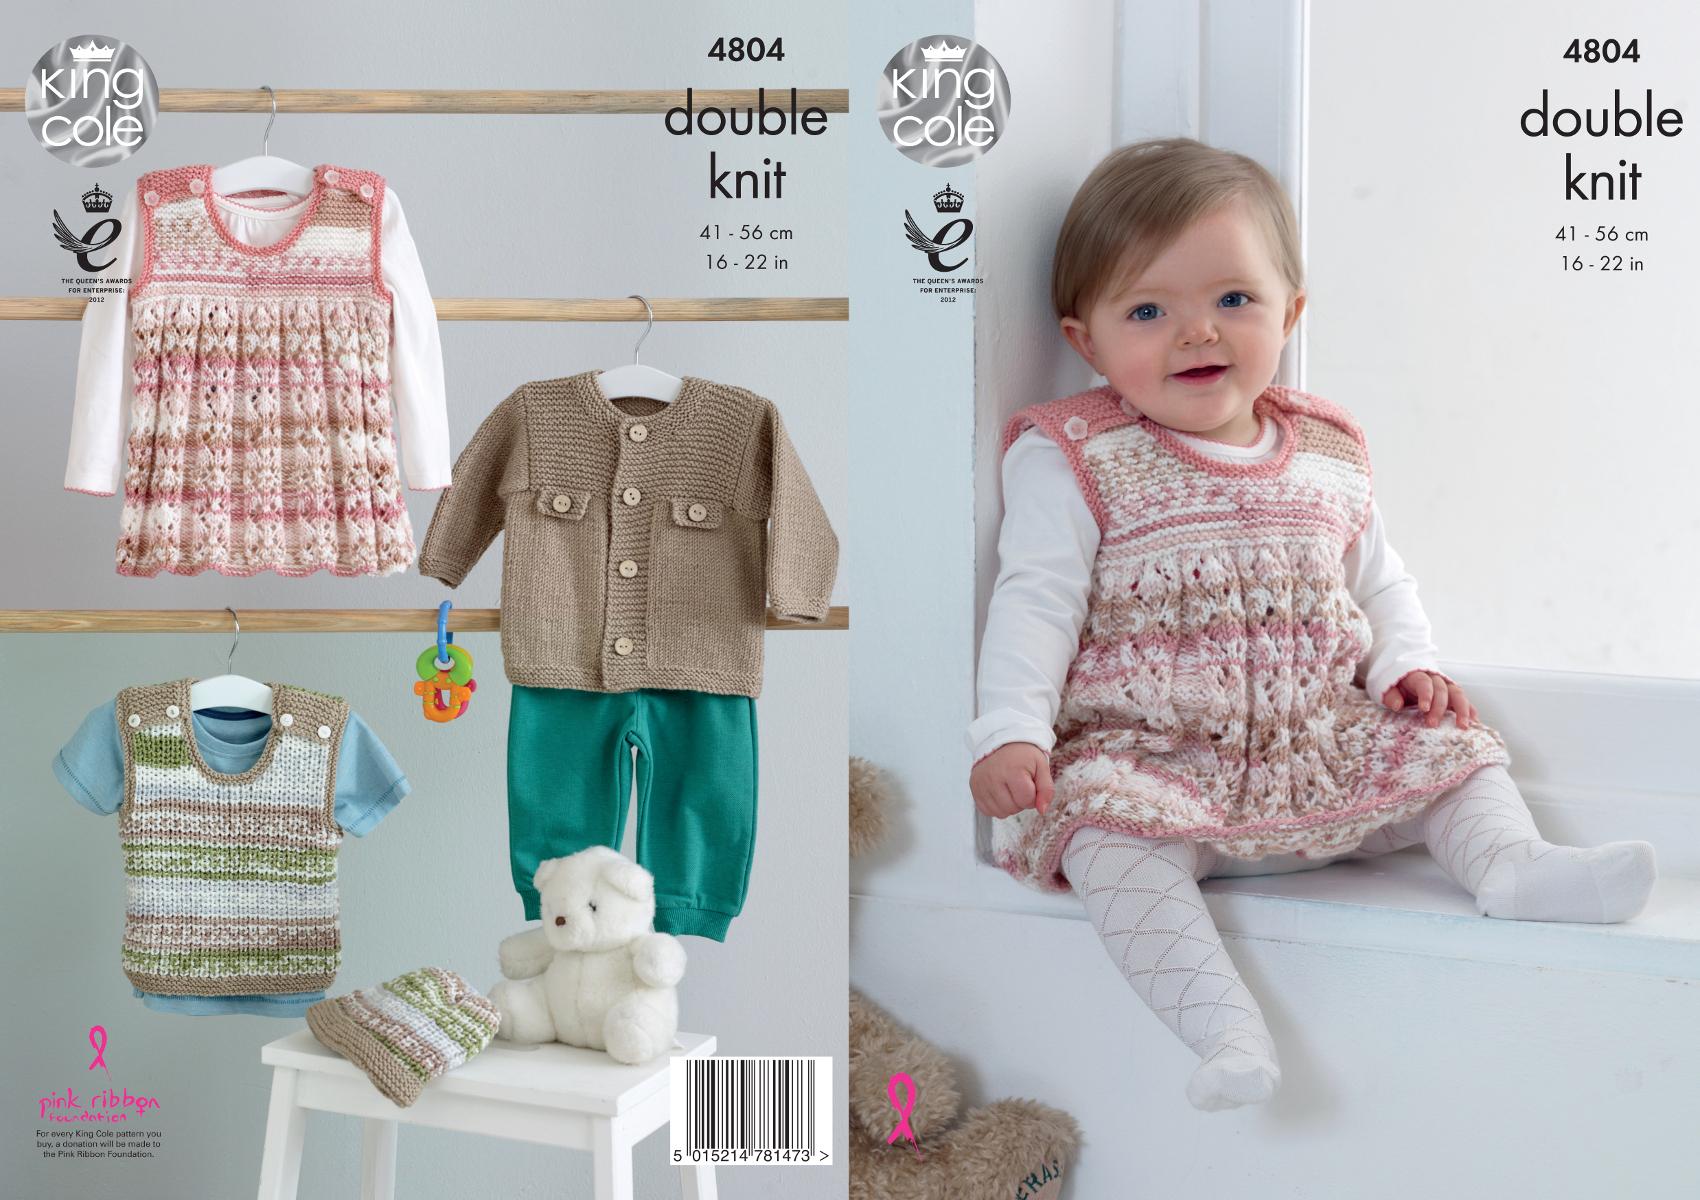 Double knitting pattern baby jacket pinafore dress top hat king double knitting pattern baby jacket pinafore dress top hat king cole dk 4804 bankloansurffo Choice Image